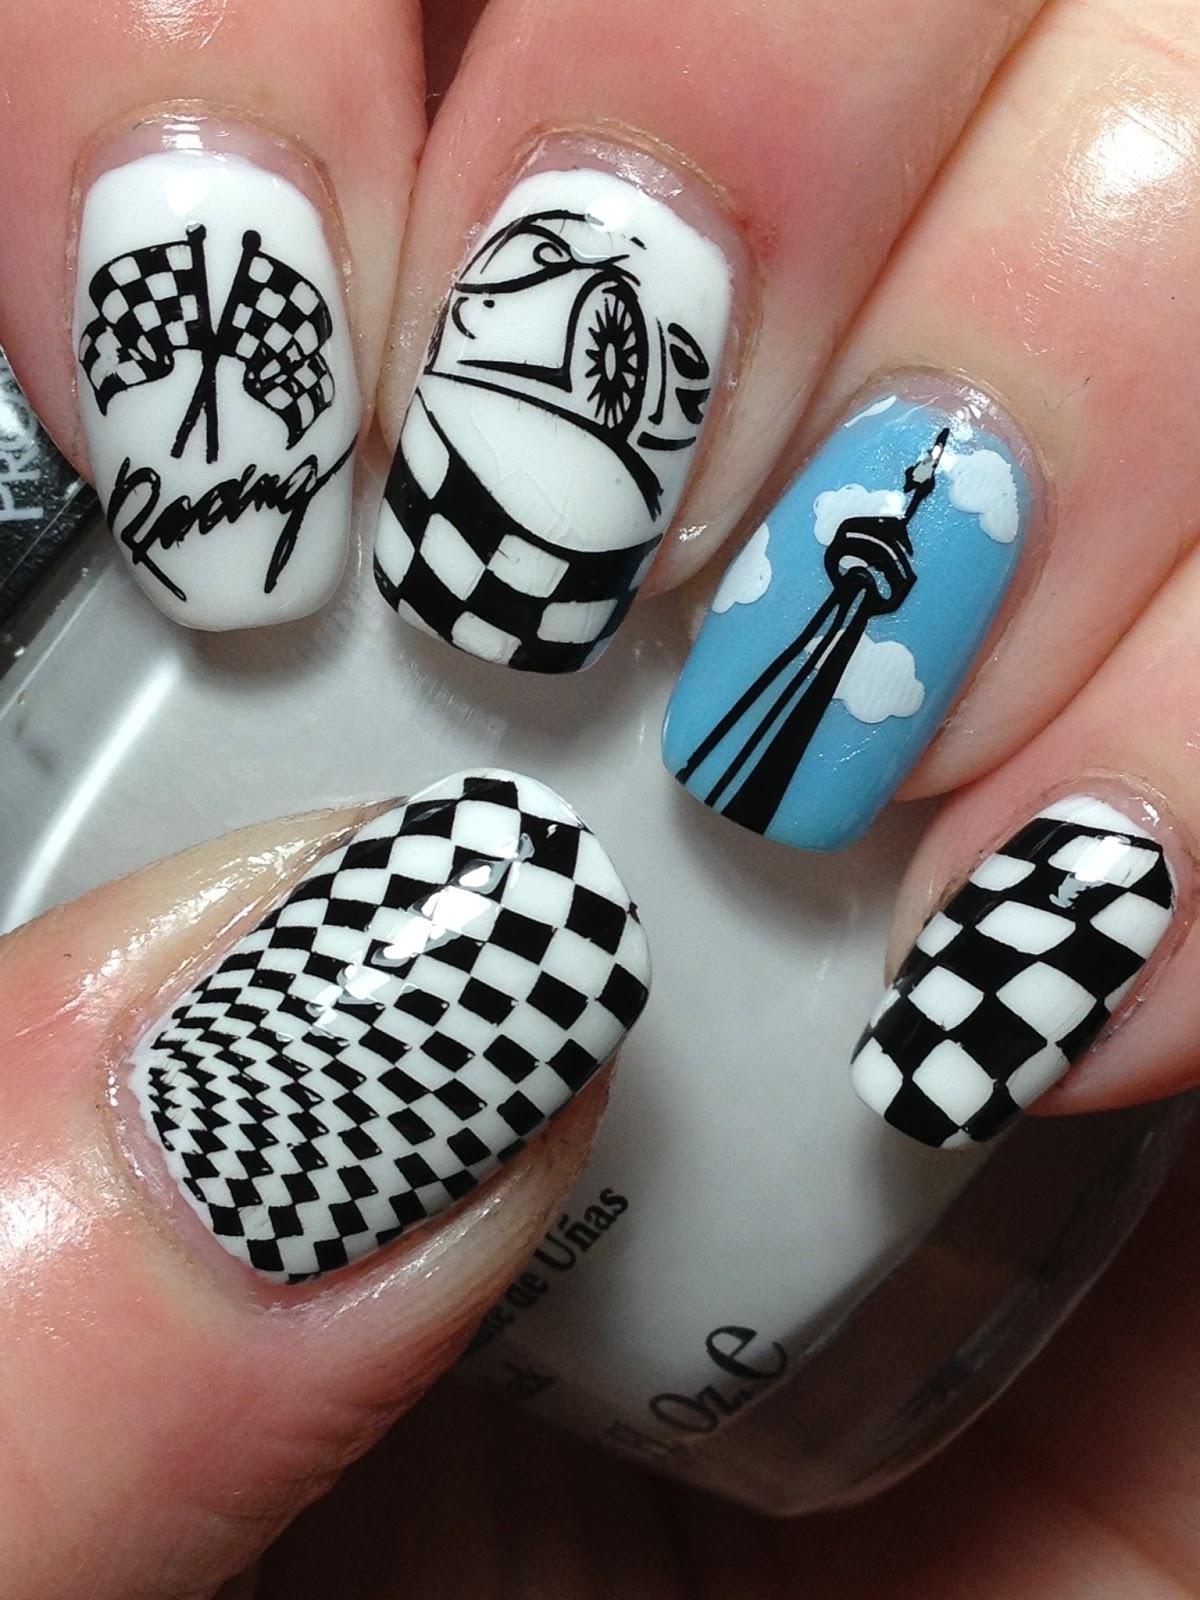 Indy 500 Nails...Plus New Plates! | Nail Art Ideas